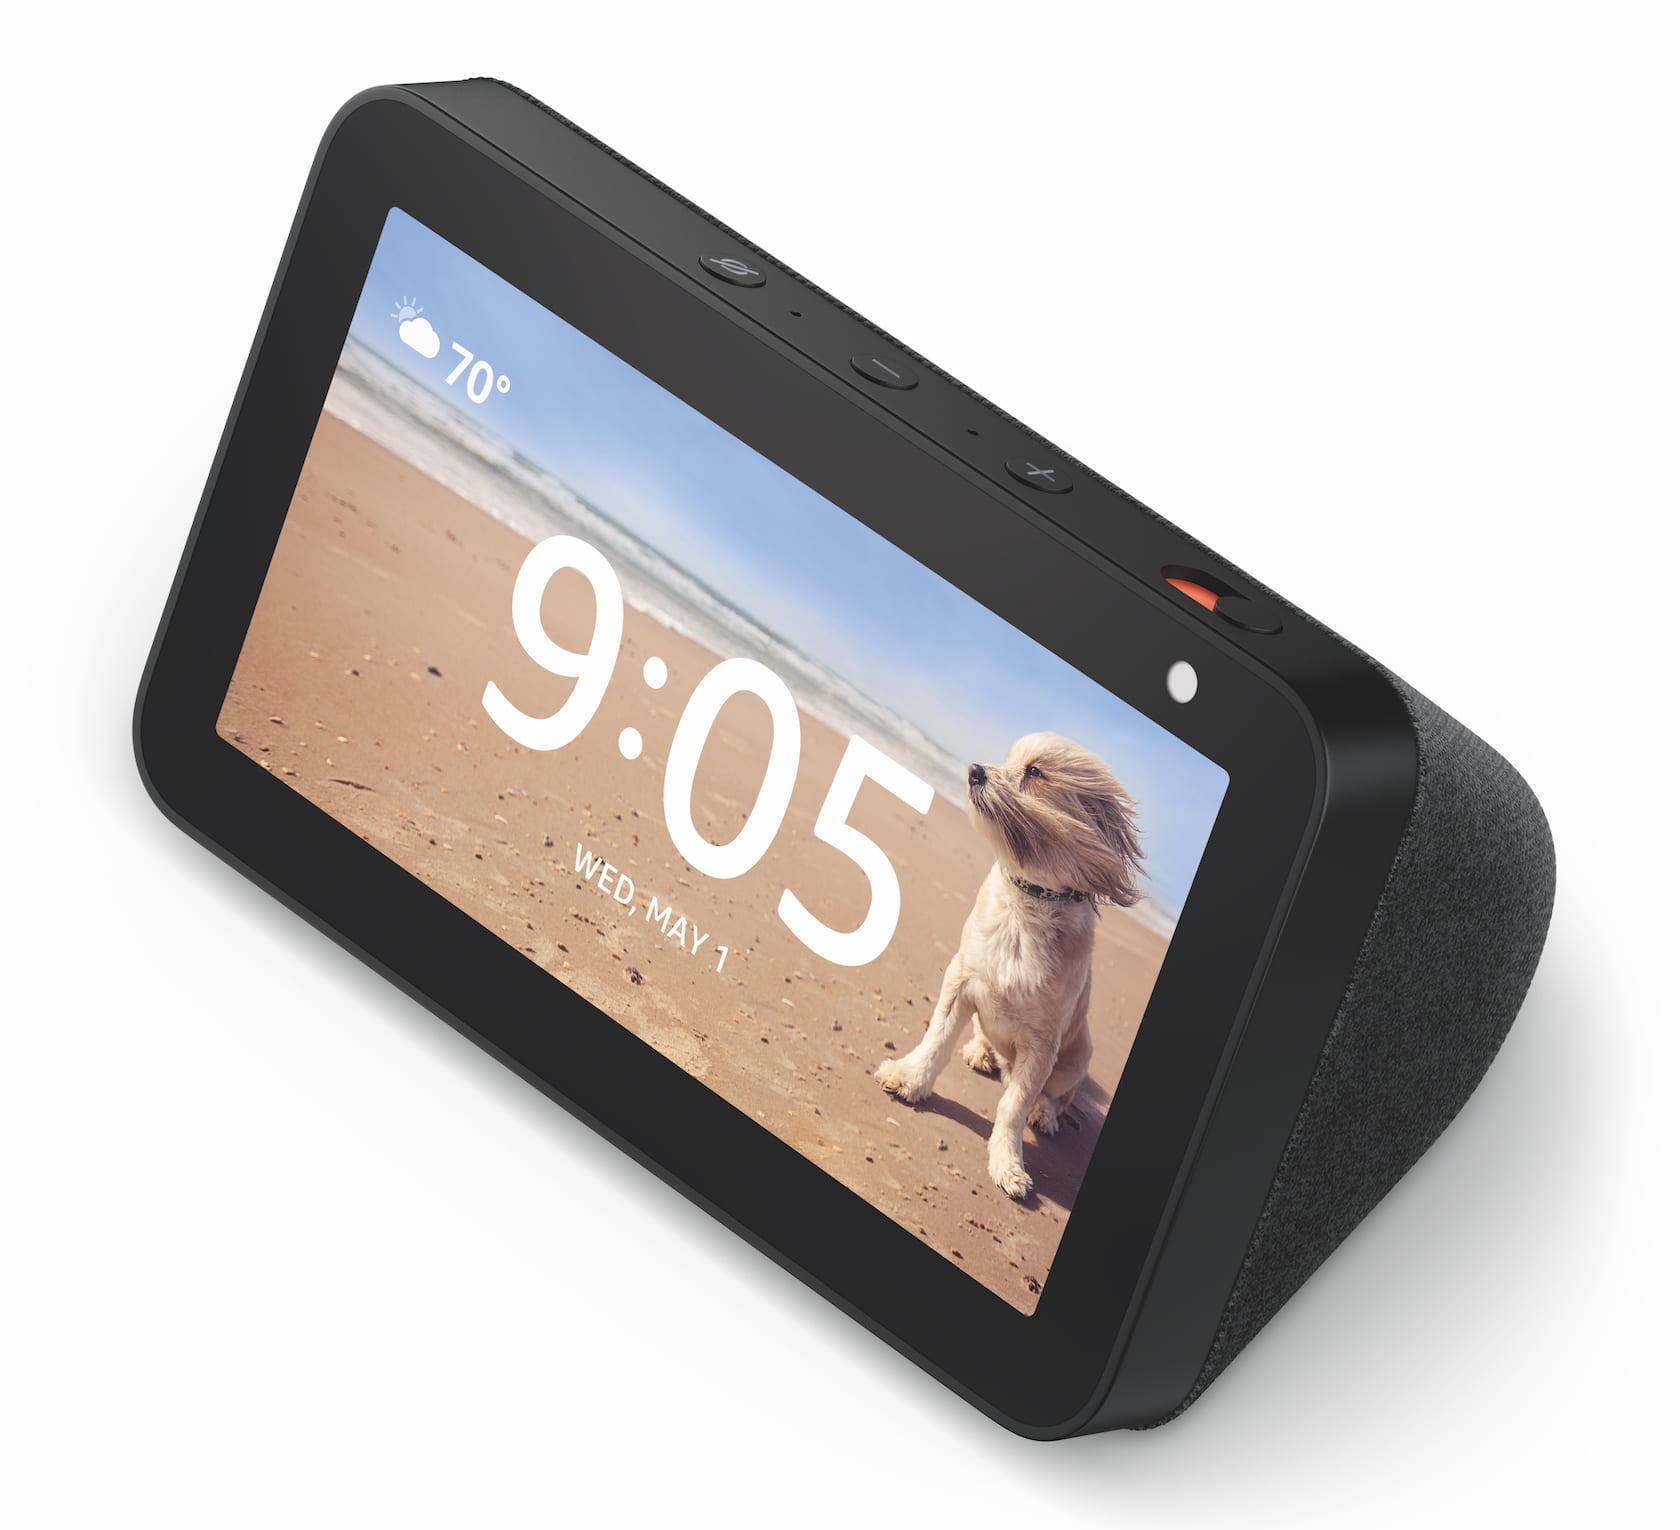 Amazon Echo Show 5 Is A $90 Alexa Smart Display With